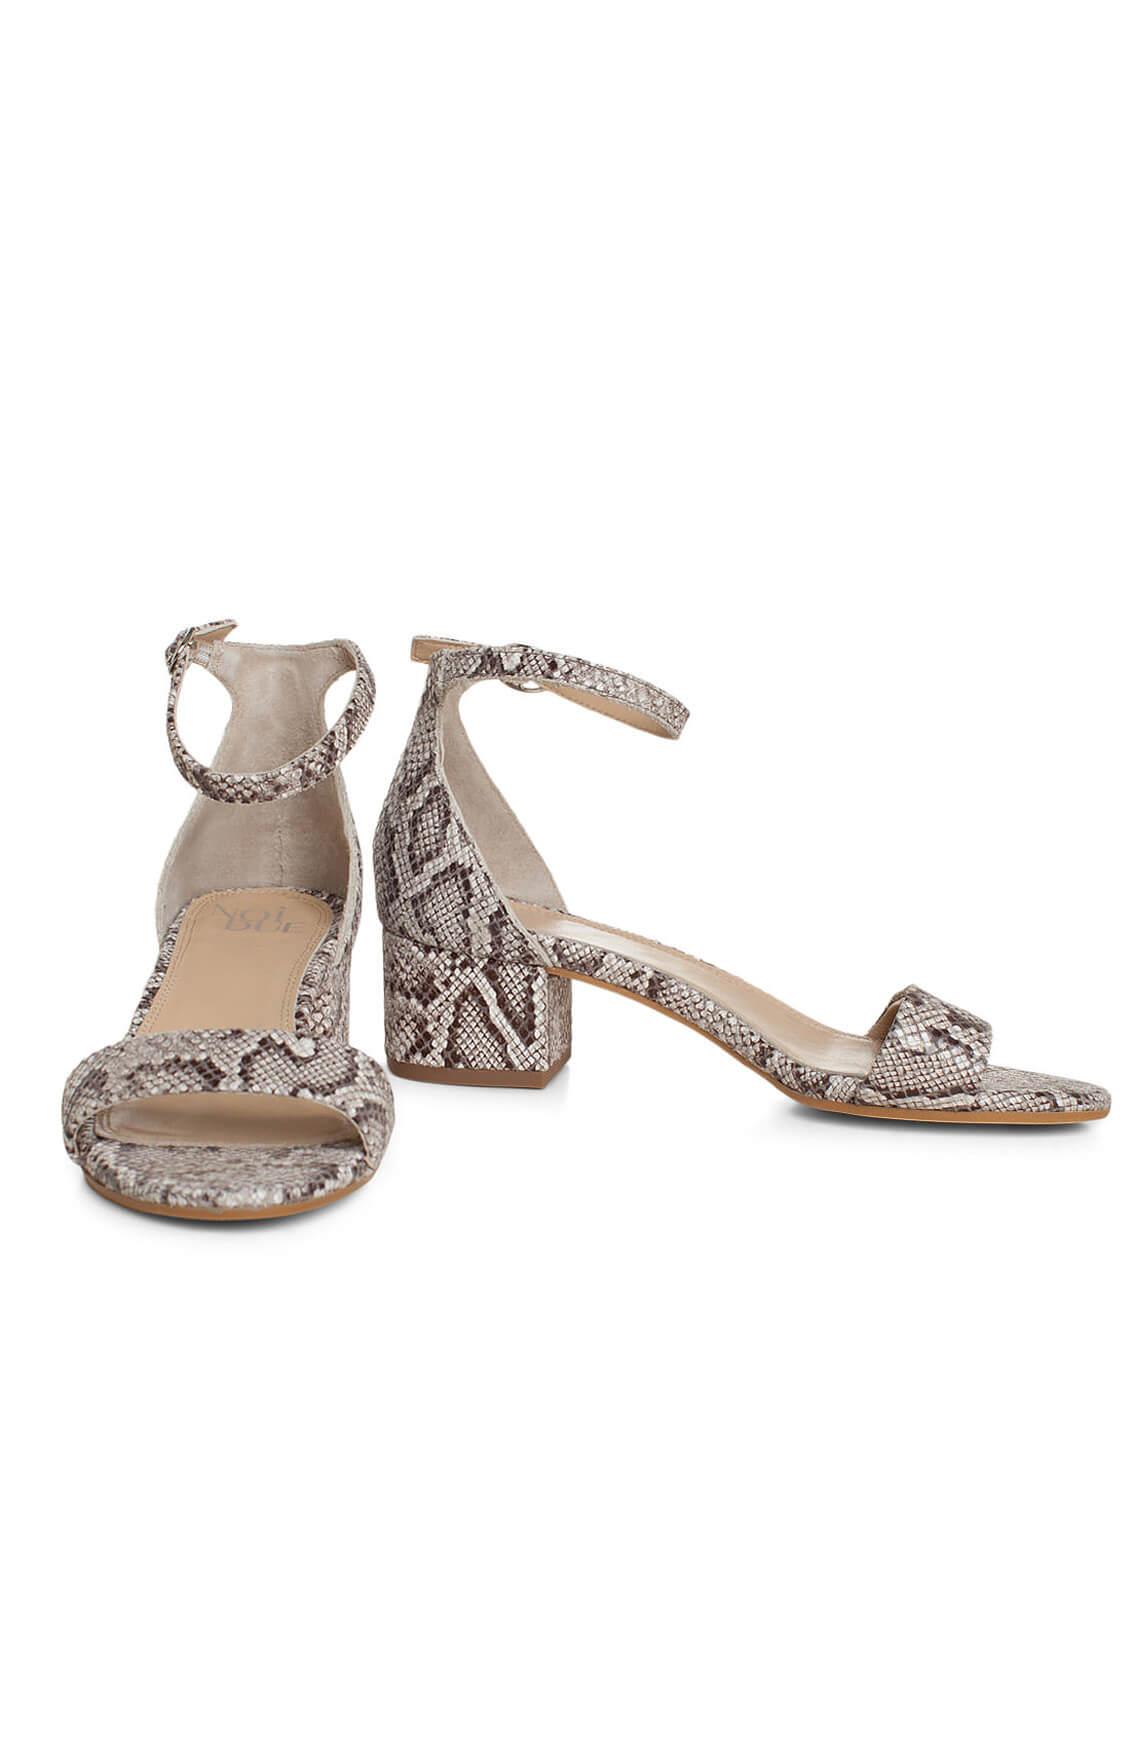 Noi Due Dames Reptielprint sandaal Grijs